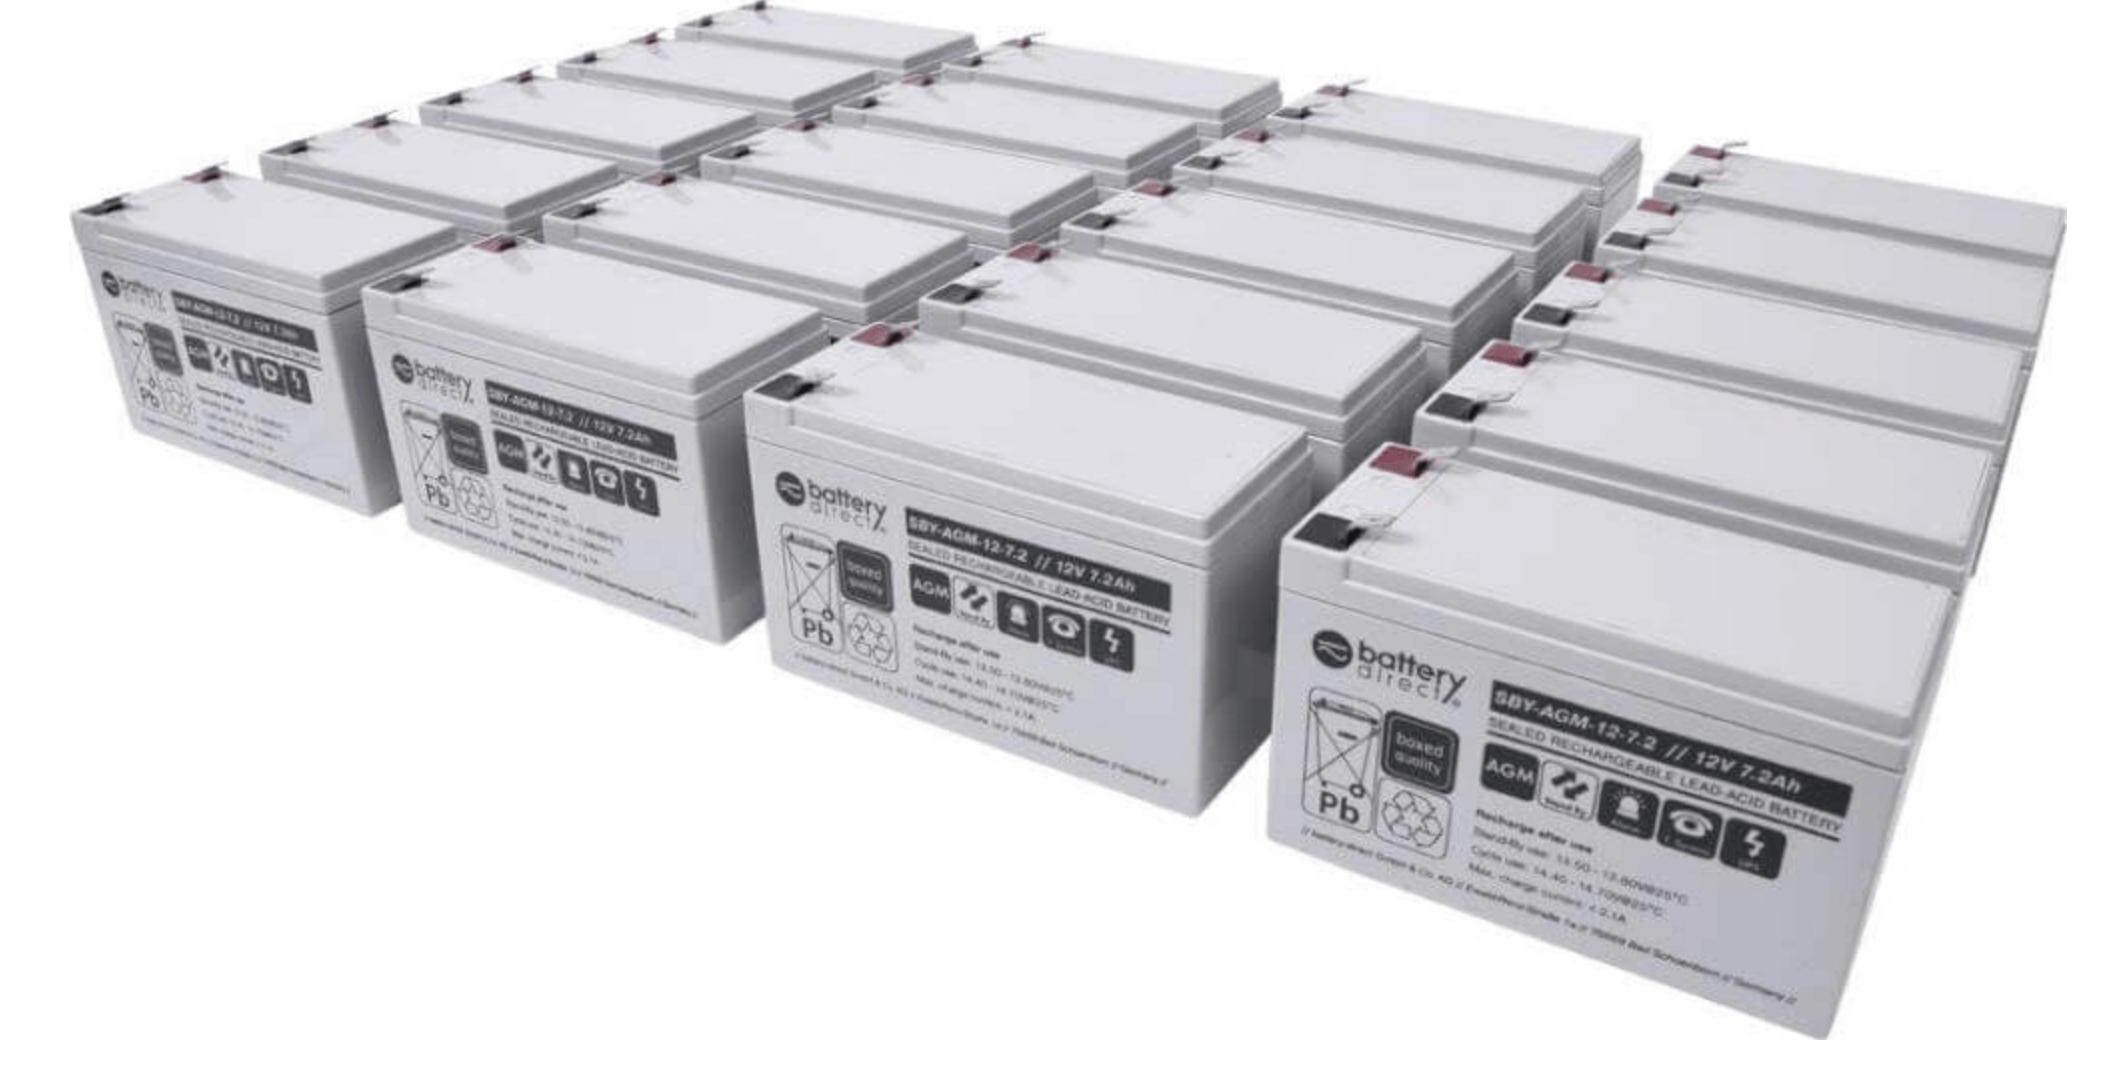 Quantity of batteries